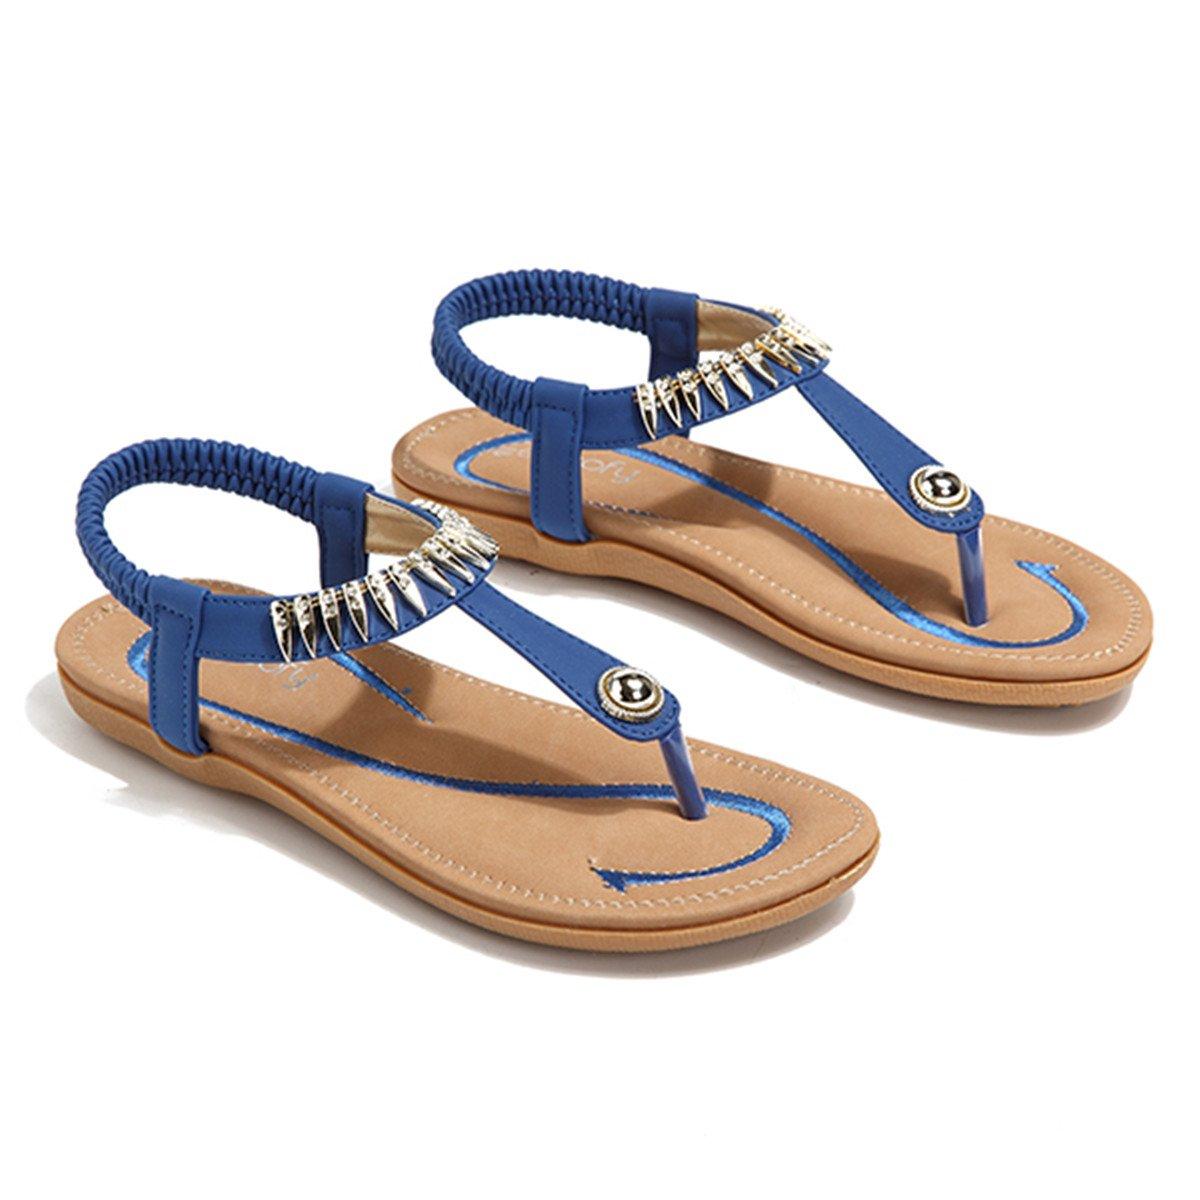 Socofy Bohemian Sandals,Women's Metal Elastic Flat Sandals Summer Bohemia Style Clip Toe Flip Flops Shoes Blue 9 B(M) US by Socofy (Image #5)